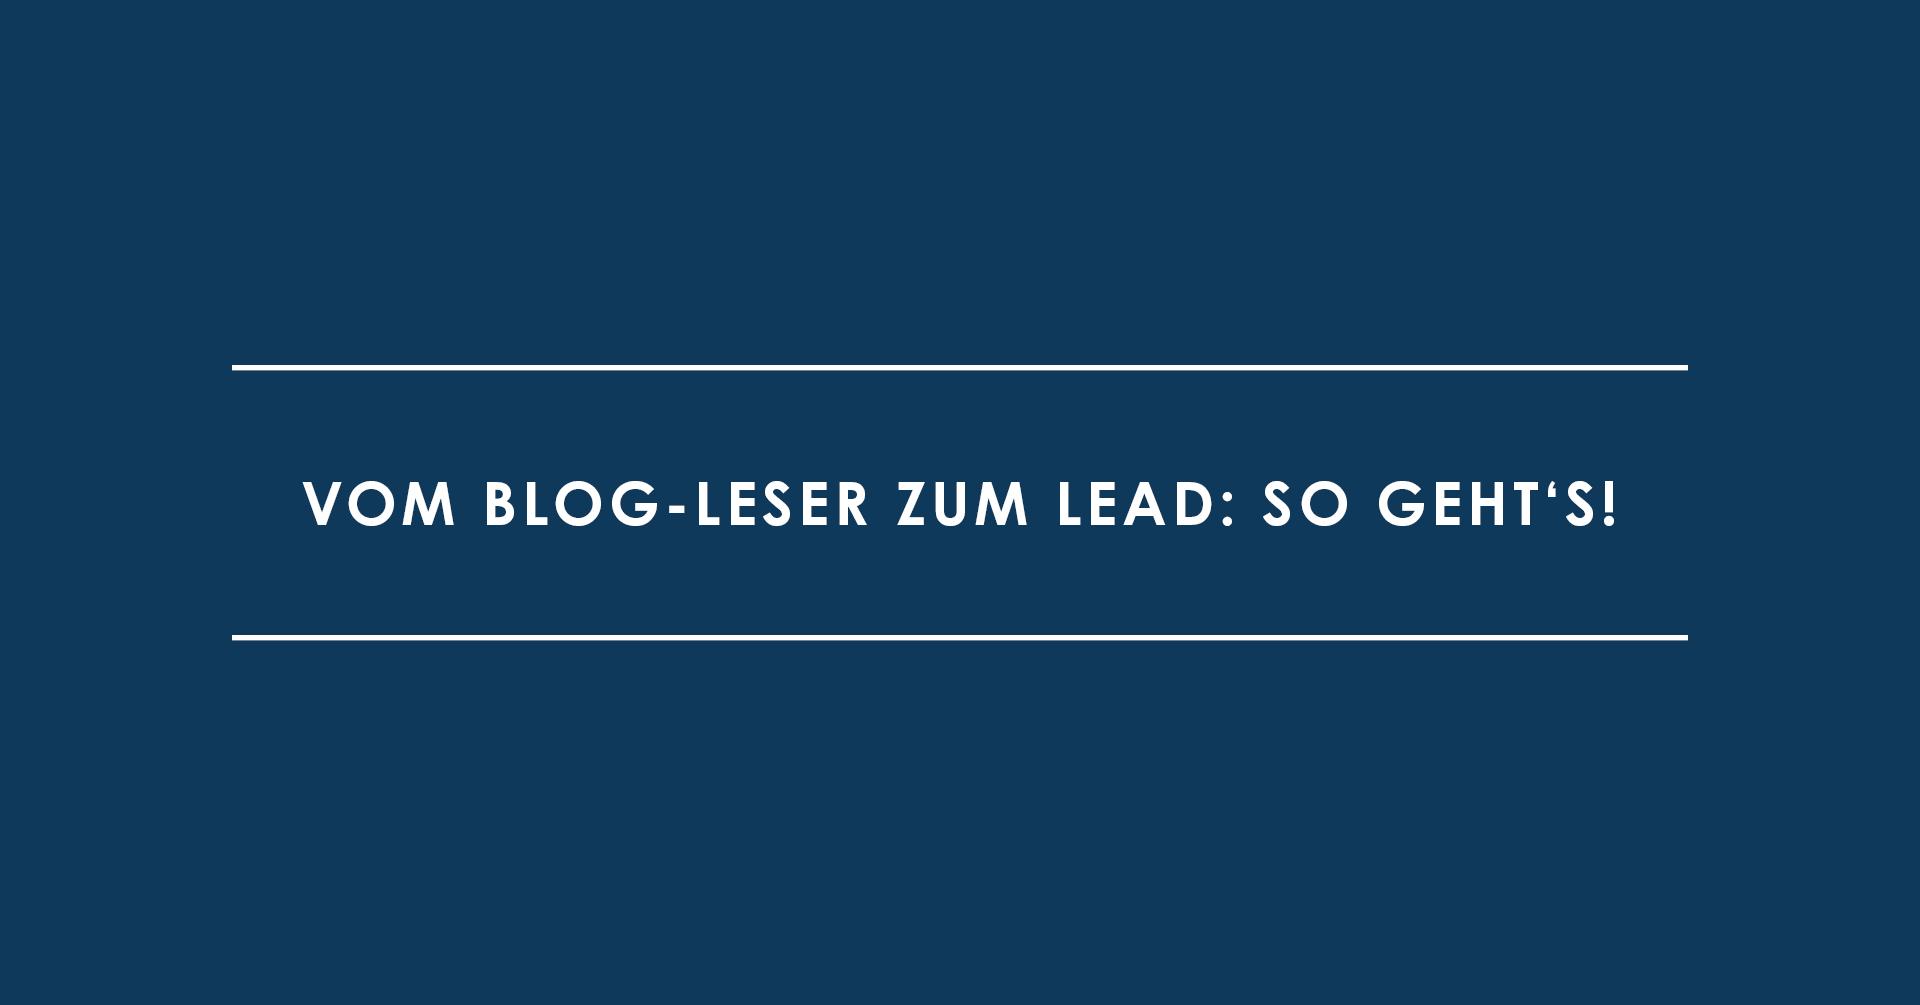 Vom Blog-Leser zum Lead: So geht's!